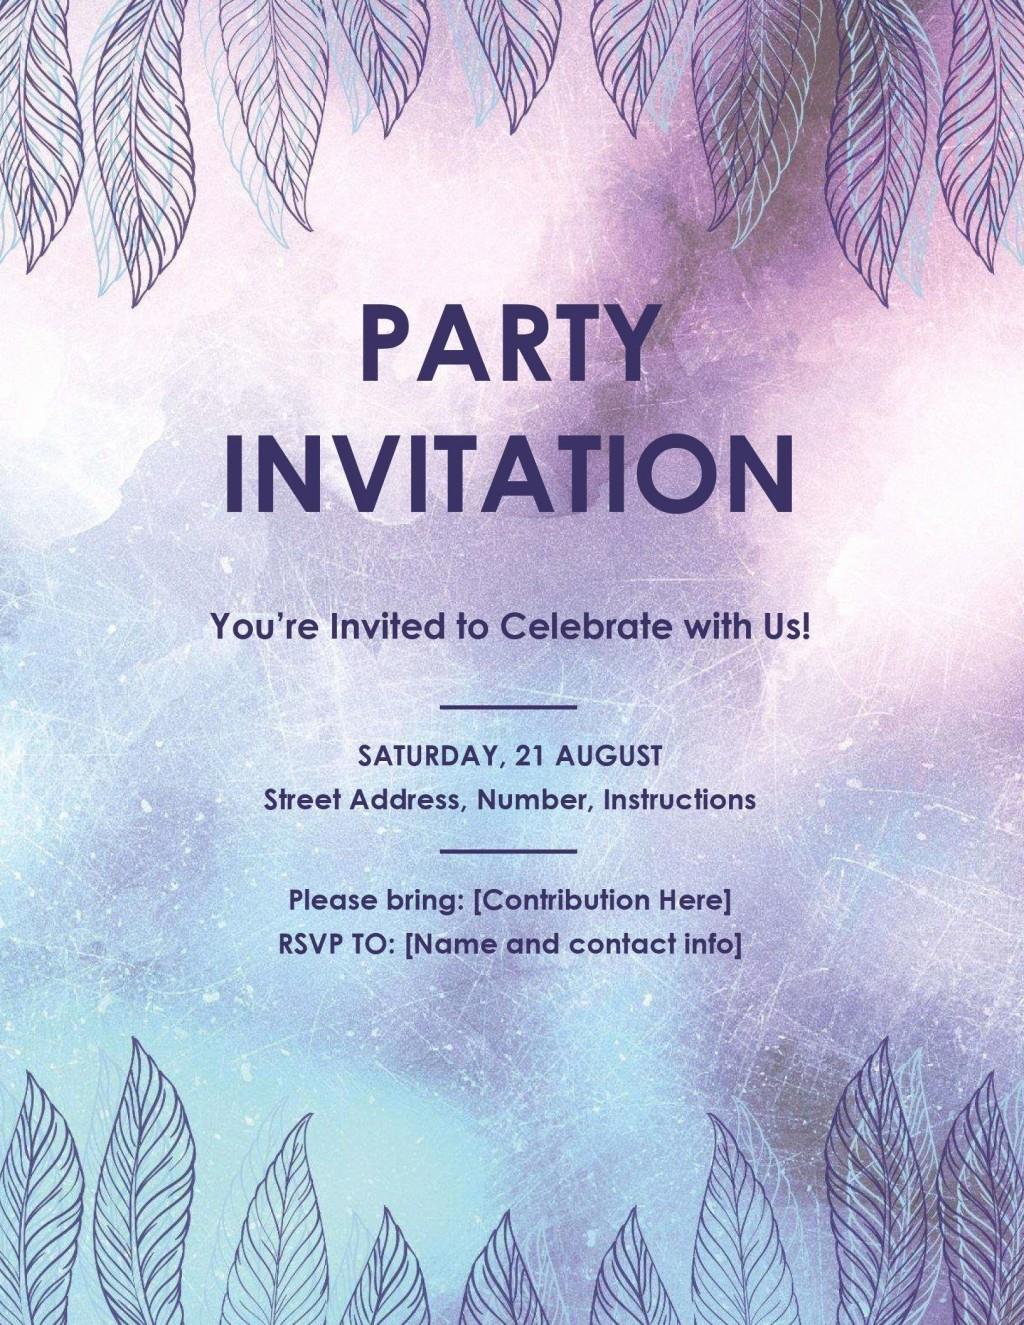 001 Rare Microsoft Office Invitation Template Photo  Templates Holiday Party PublisherLarge